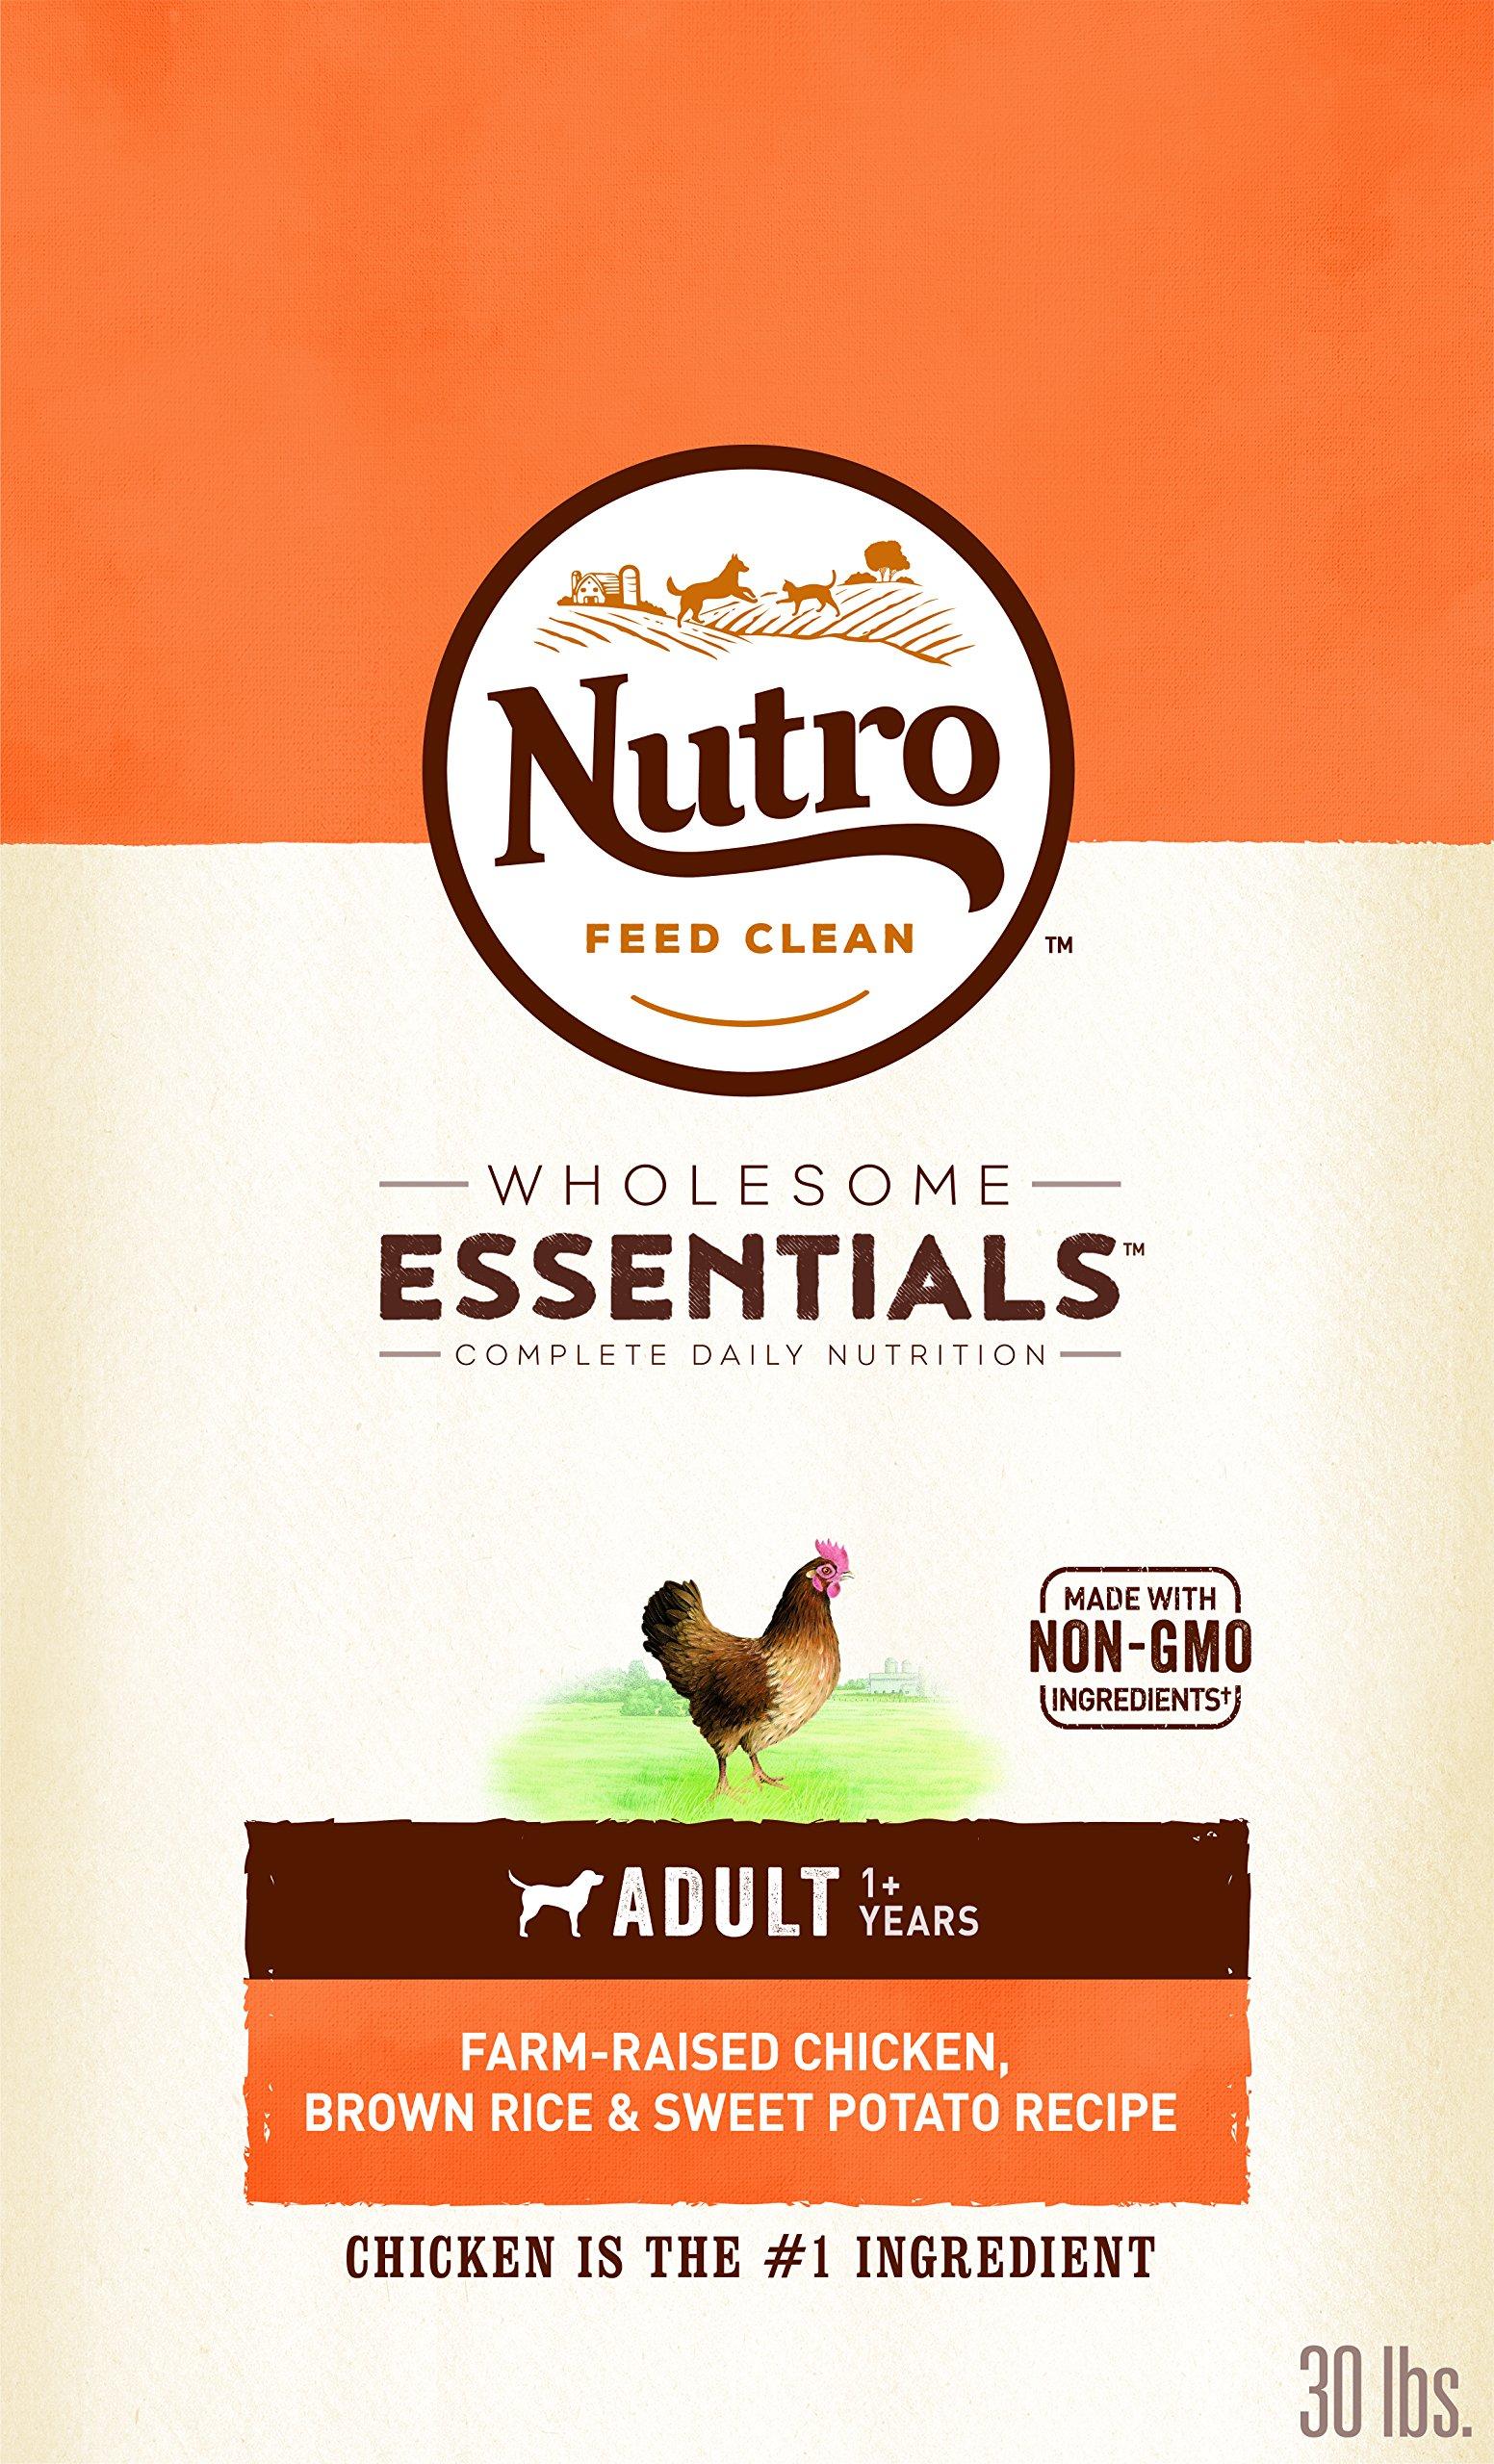 Nutro Wholesome Essentials Adult Dry Dog Food Farm-Raised Chicken, Brown Rice & Sweet Potato Recipe, 30 lb. Bag